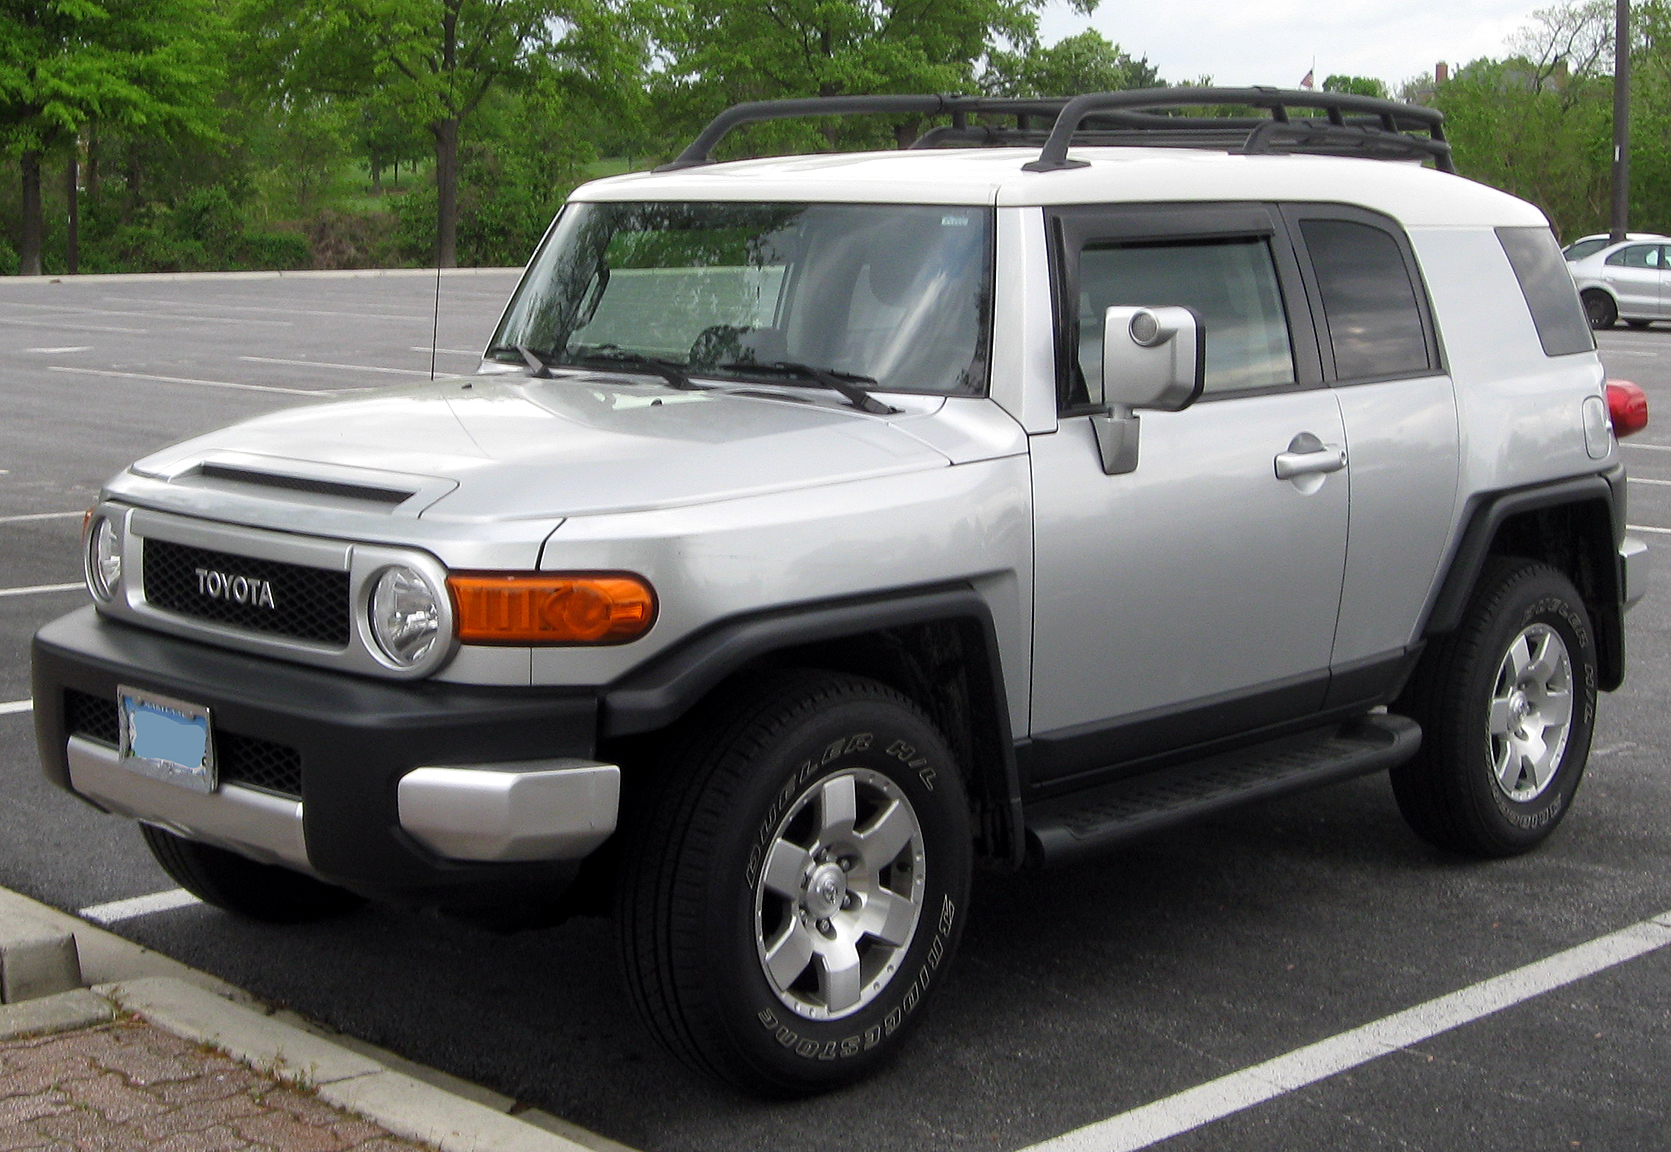 File:Toyota FJ Cruiser -- 04-27-2011 1.jpg - Wikimedia Commons